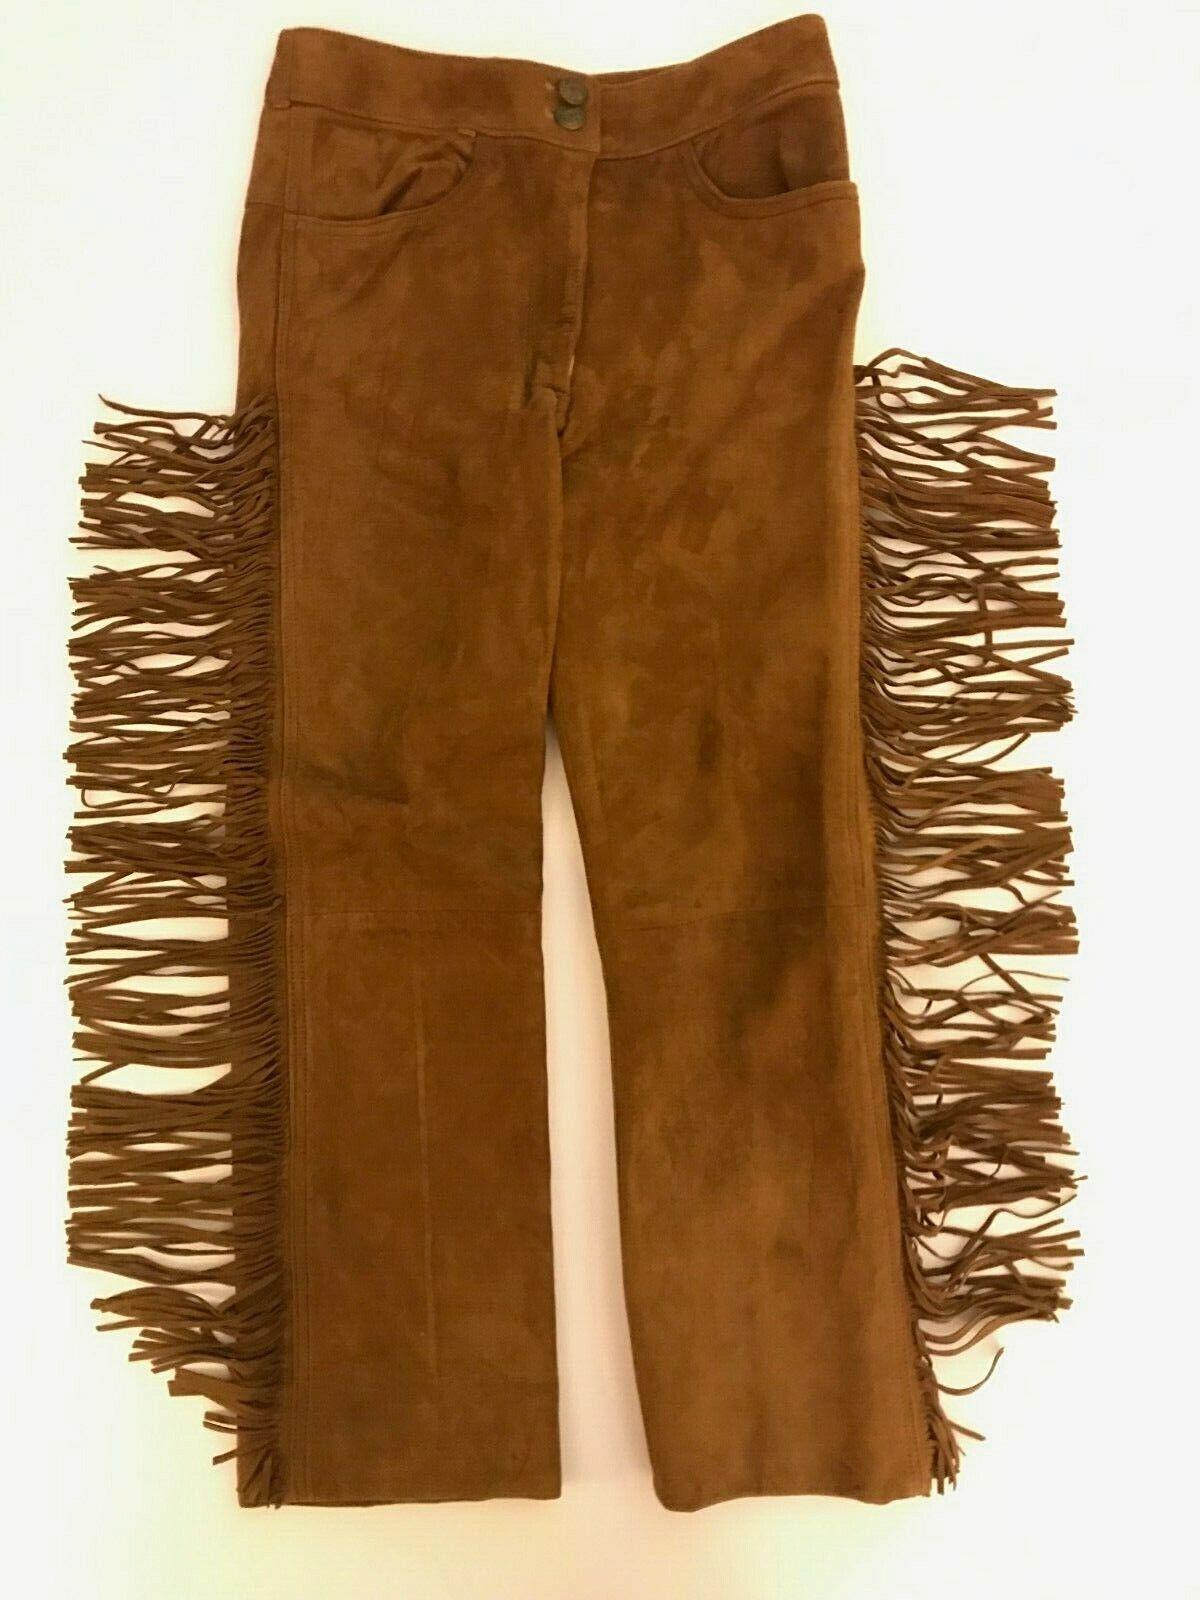 Saks Fifth Avenue Women's Chestnut Suede Fringe High Waist Pants Fully Lined